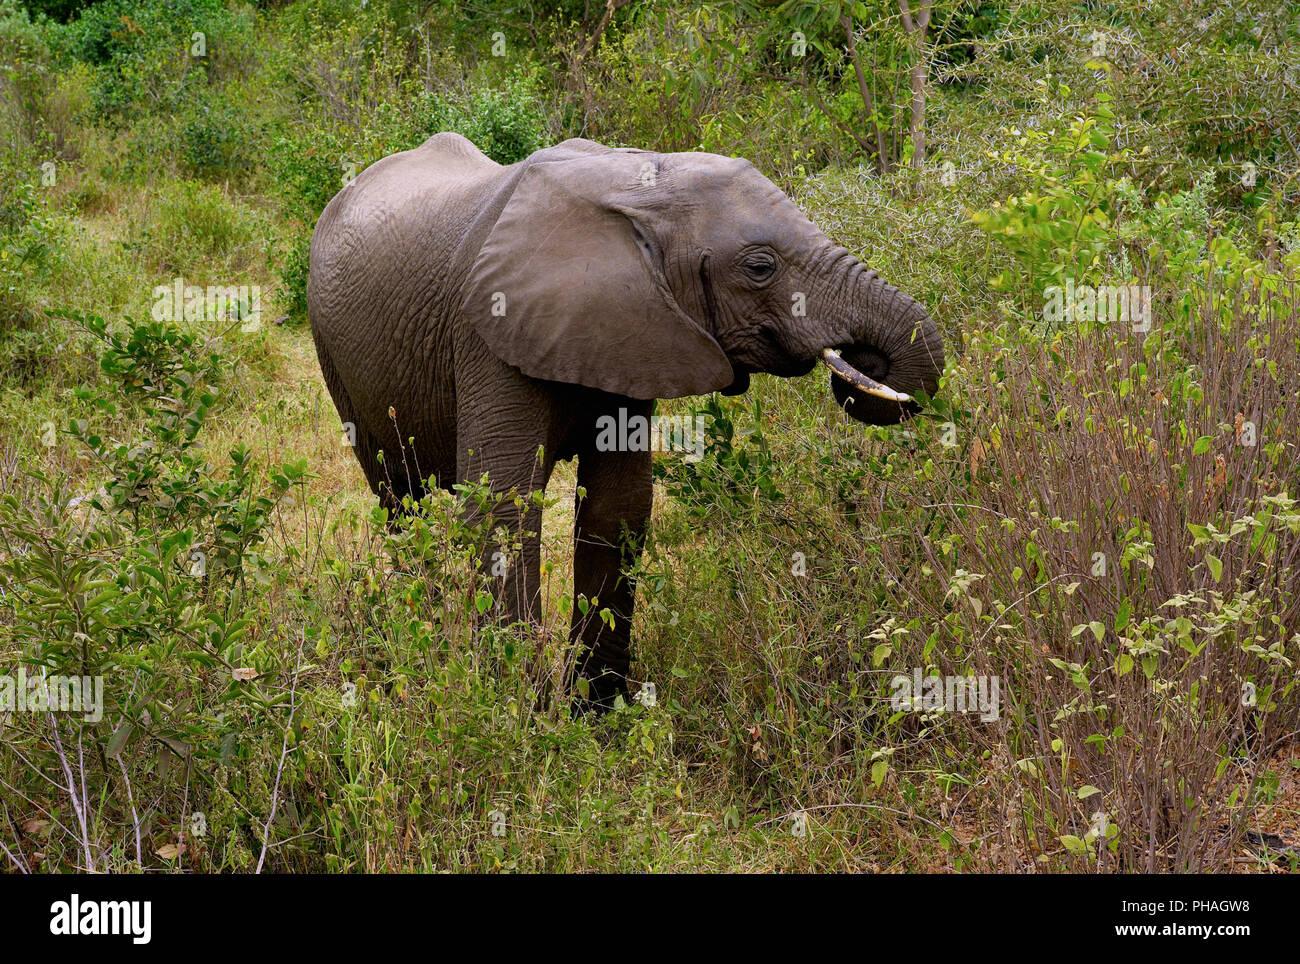 Elephant Grazing in Lake Manyara National Park - Stock Image